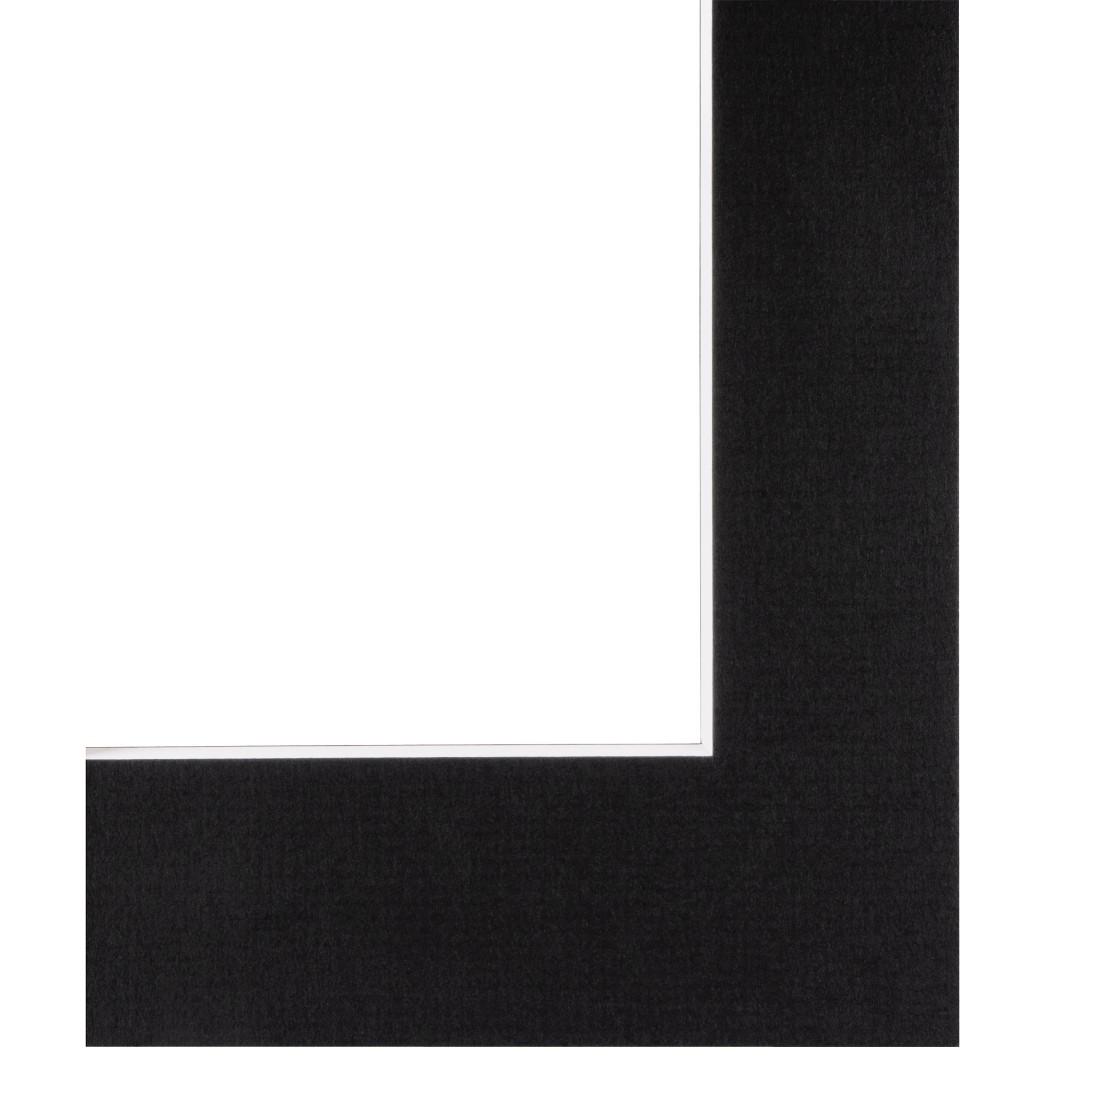 hama.de | 00063247 Hama Premium-Passepartout, Schwarz, 40 x 50 cm ...